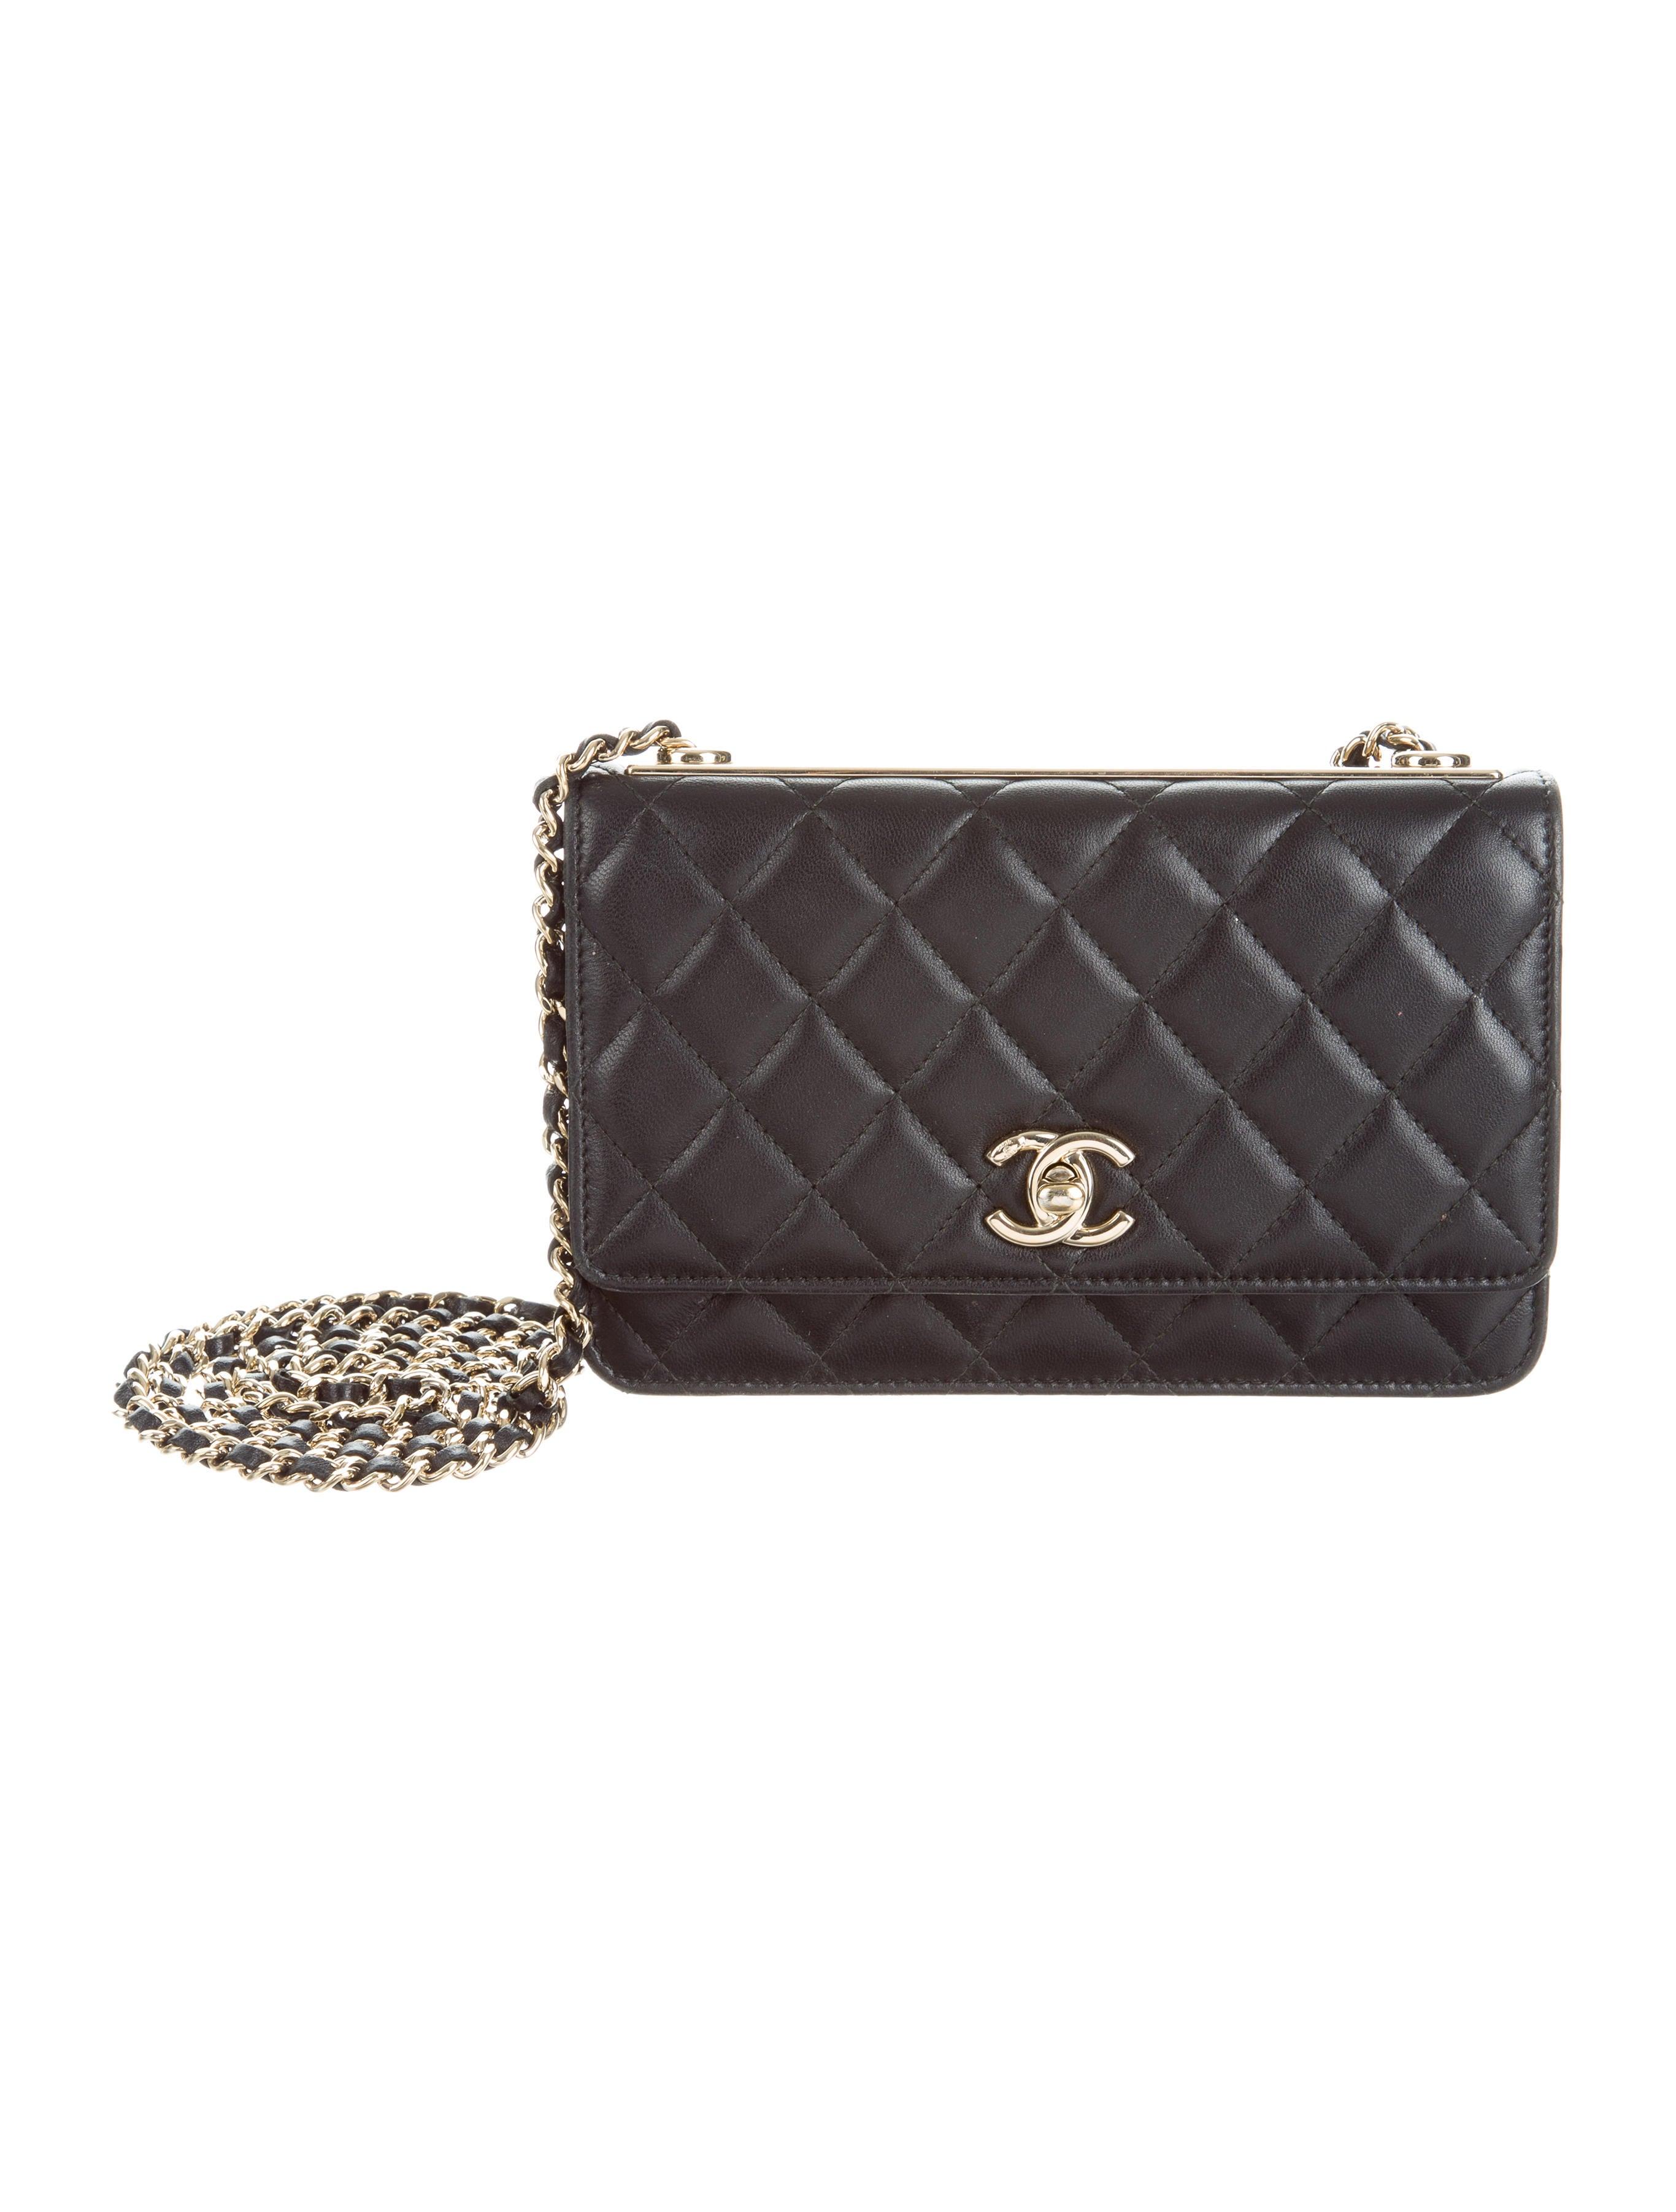 9b00266946c3 Chanel 2017 Trendy CC Wallet On Chain - Handbags - CHA180727